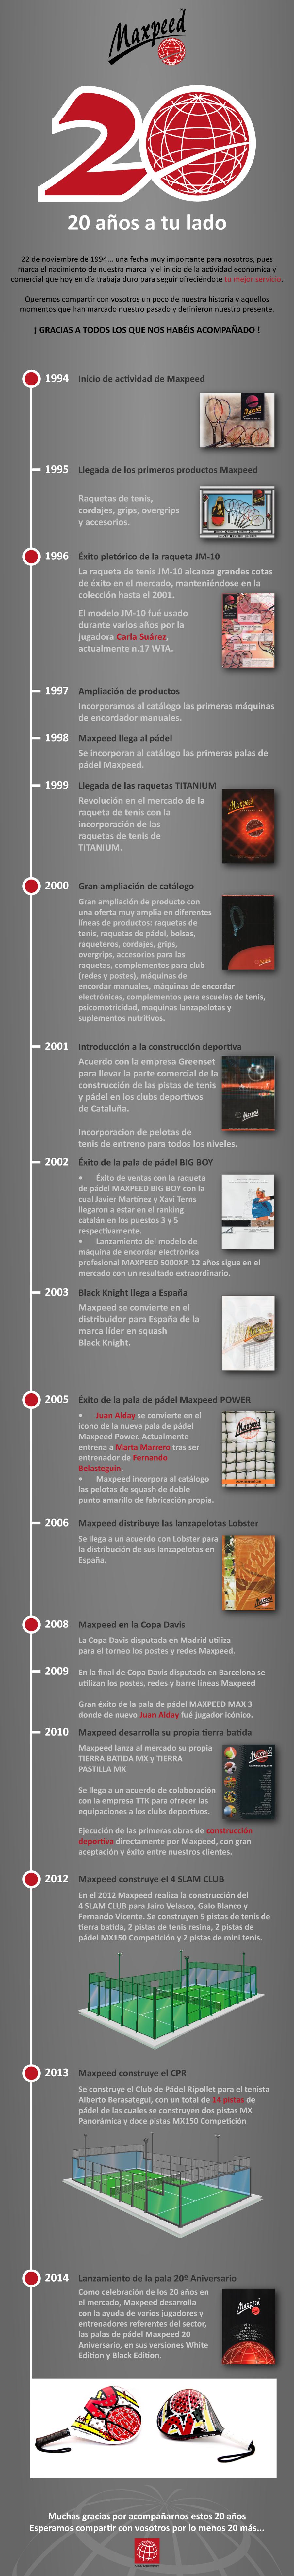 infografia-20-aniversario-maxpeed